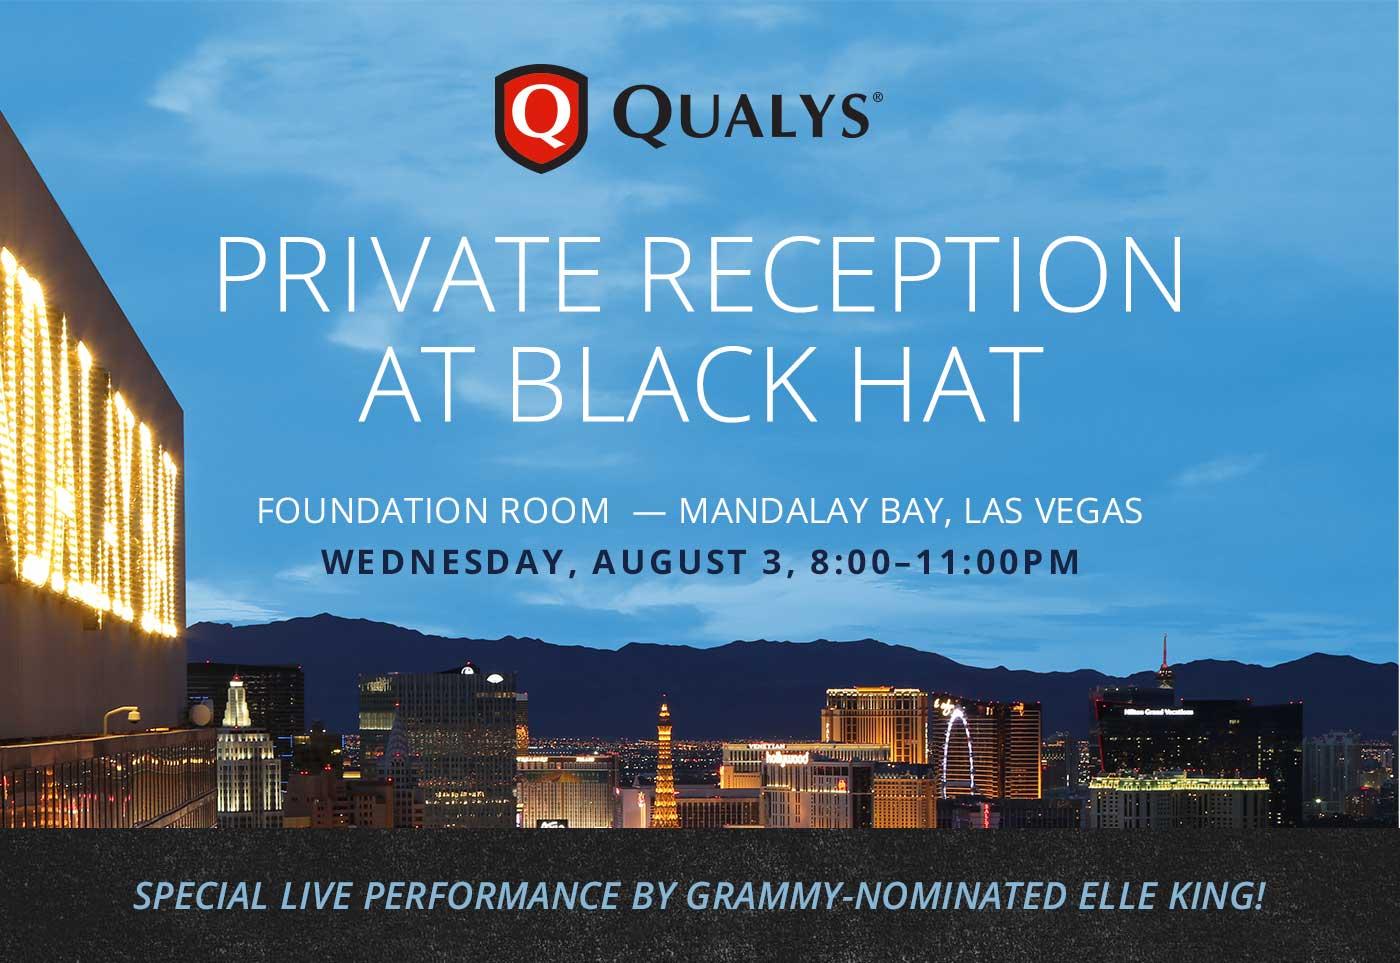 Qualys Private Reception at BlackHat 2016